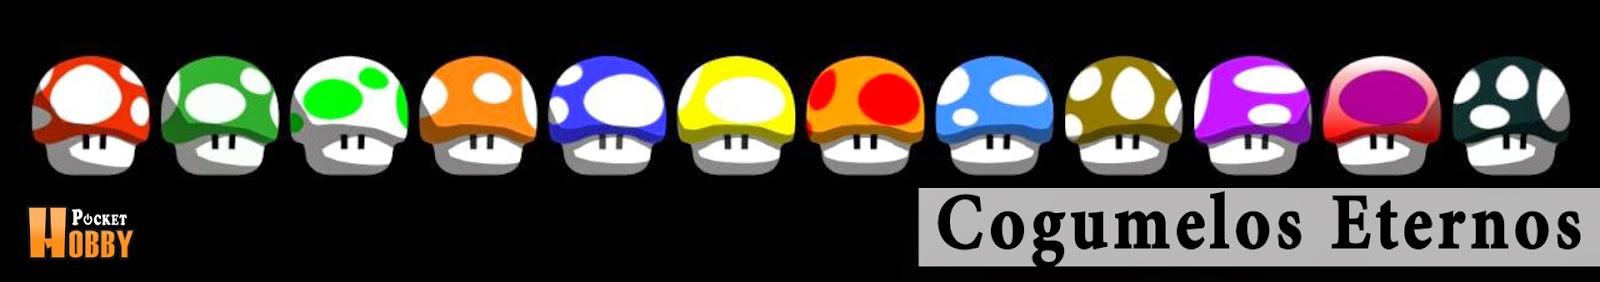 Pocket Hobby - www.pockethobby.com - Play For Hobby - Cogumelos Nintendo!